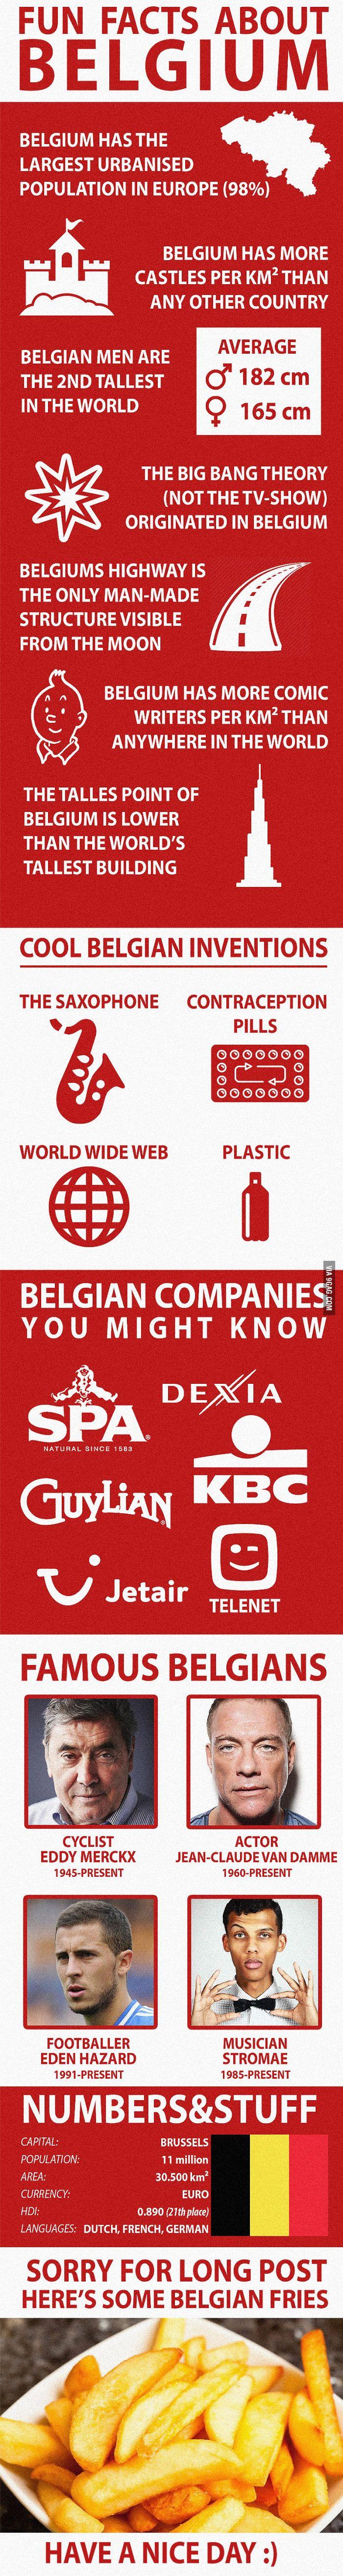 Fun Facts about Belgium - 9GAG